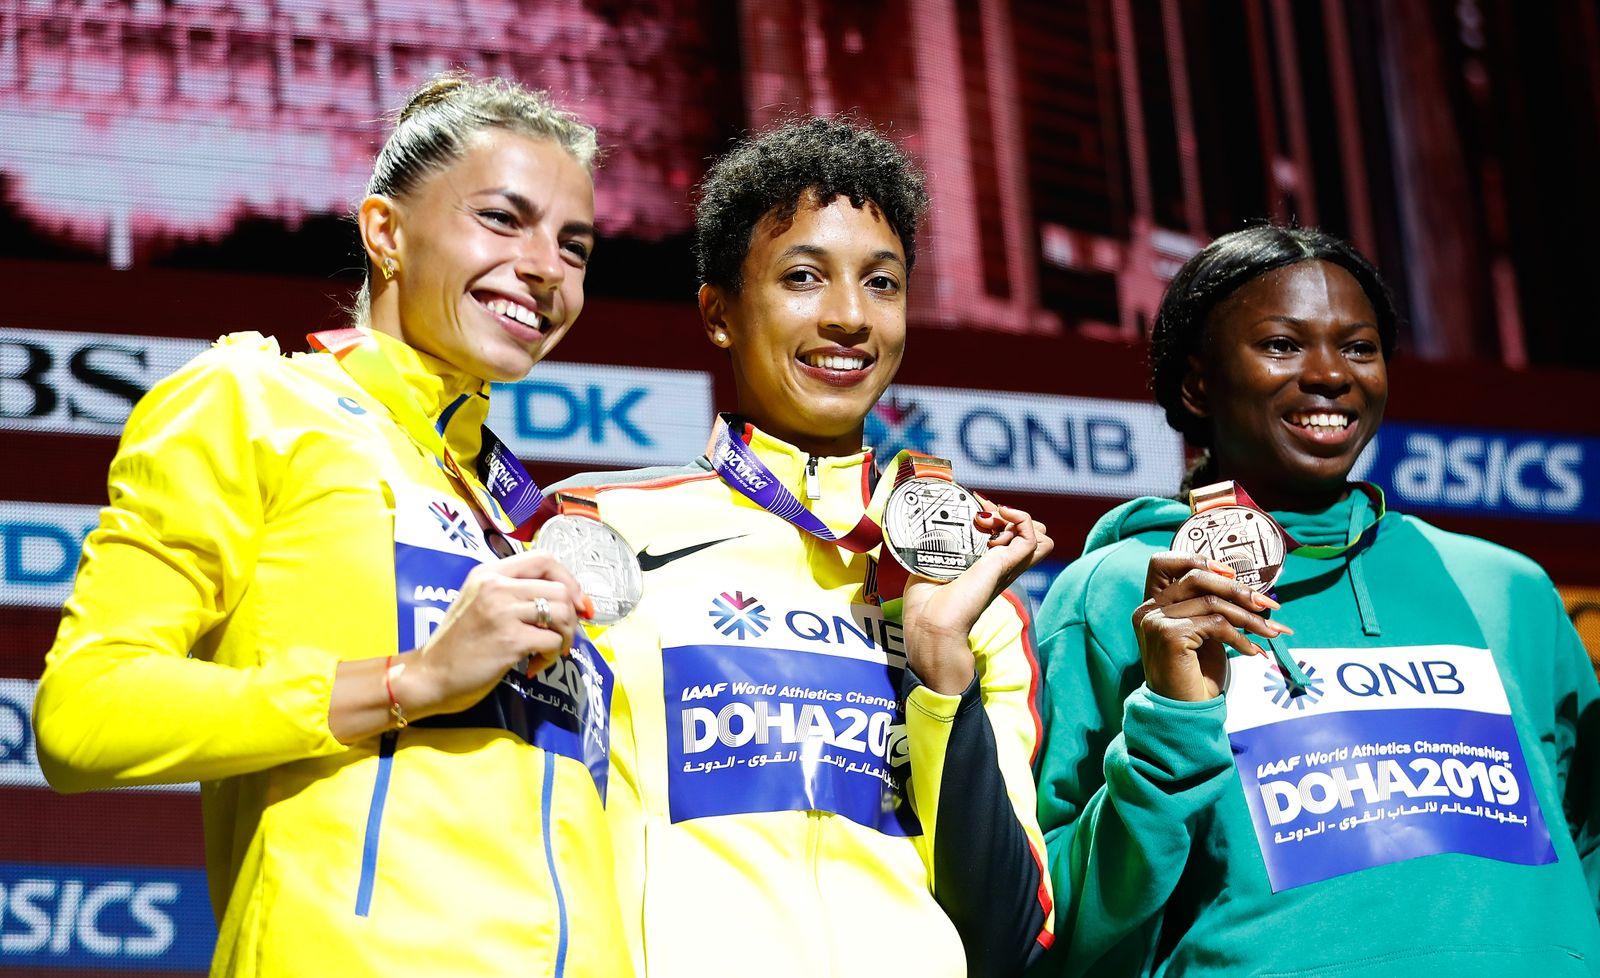 (191007) -- DOHA, Oct. 7, 2019 -- Silver medalist, Maryna Bekh-Romanchuk of Ukraine, gold medalist, Malaika Mihambo of G